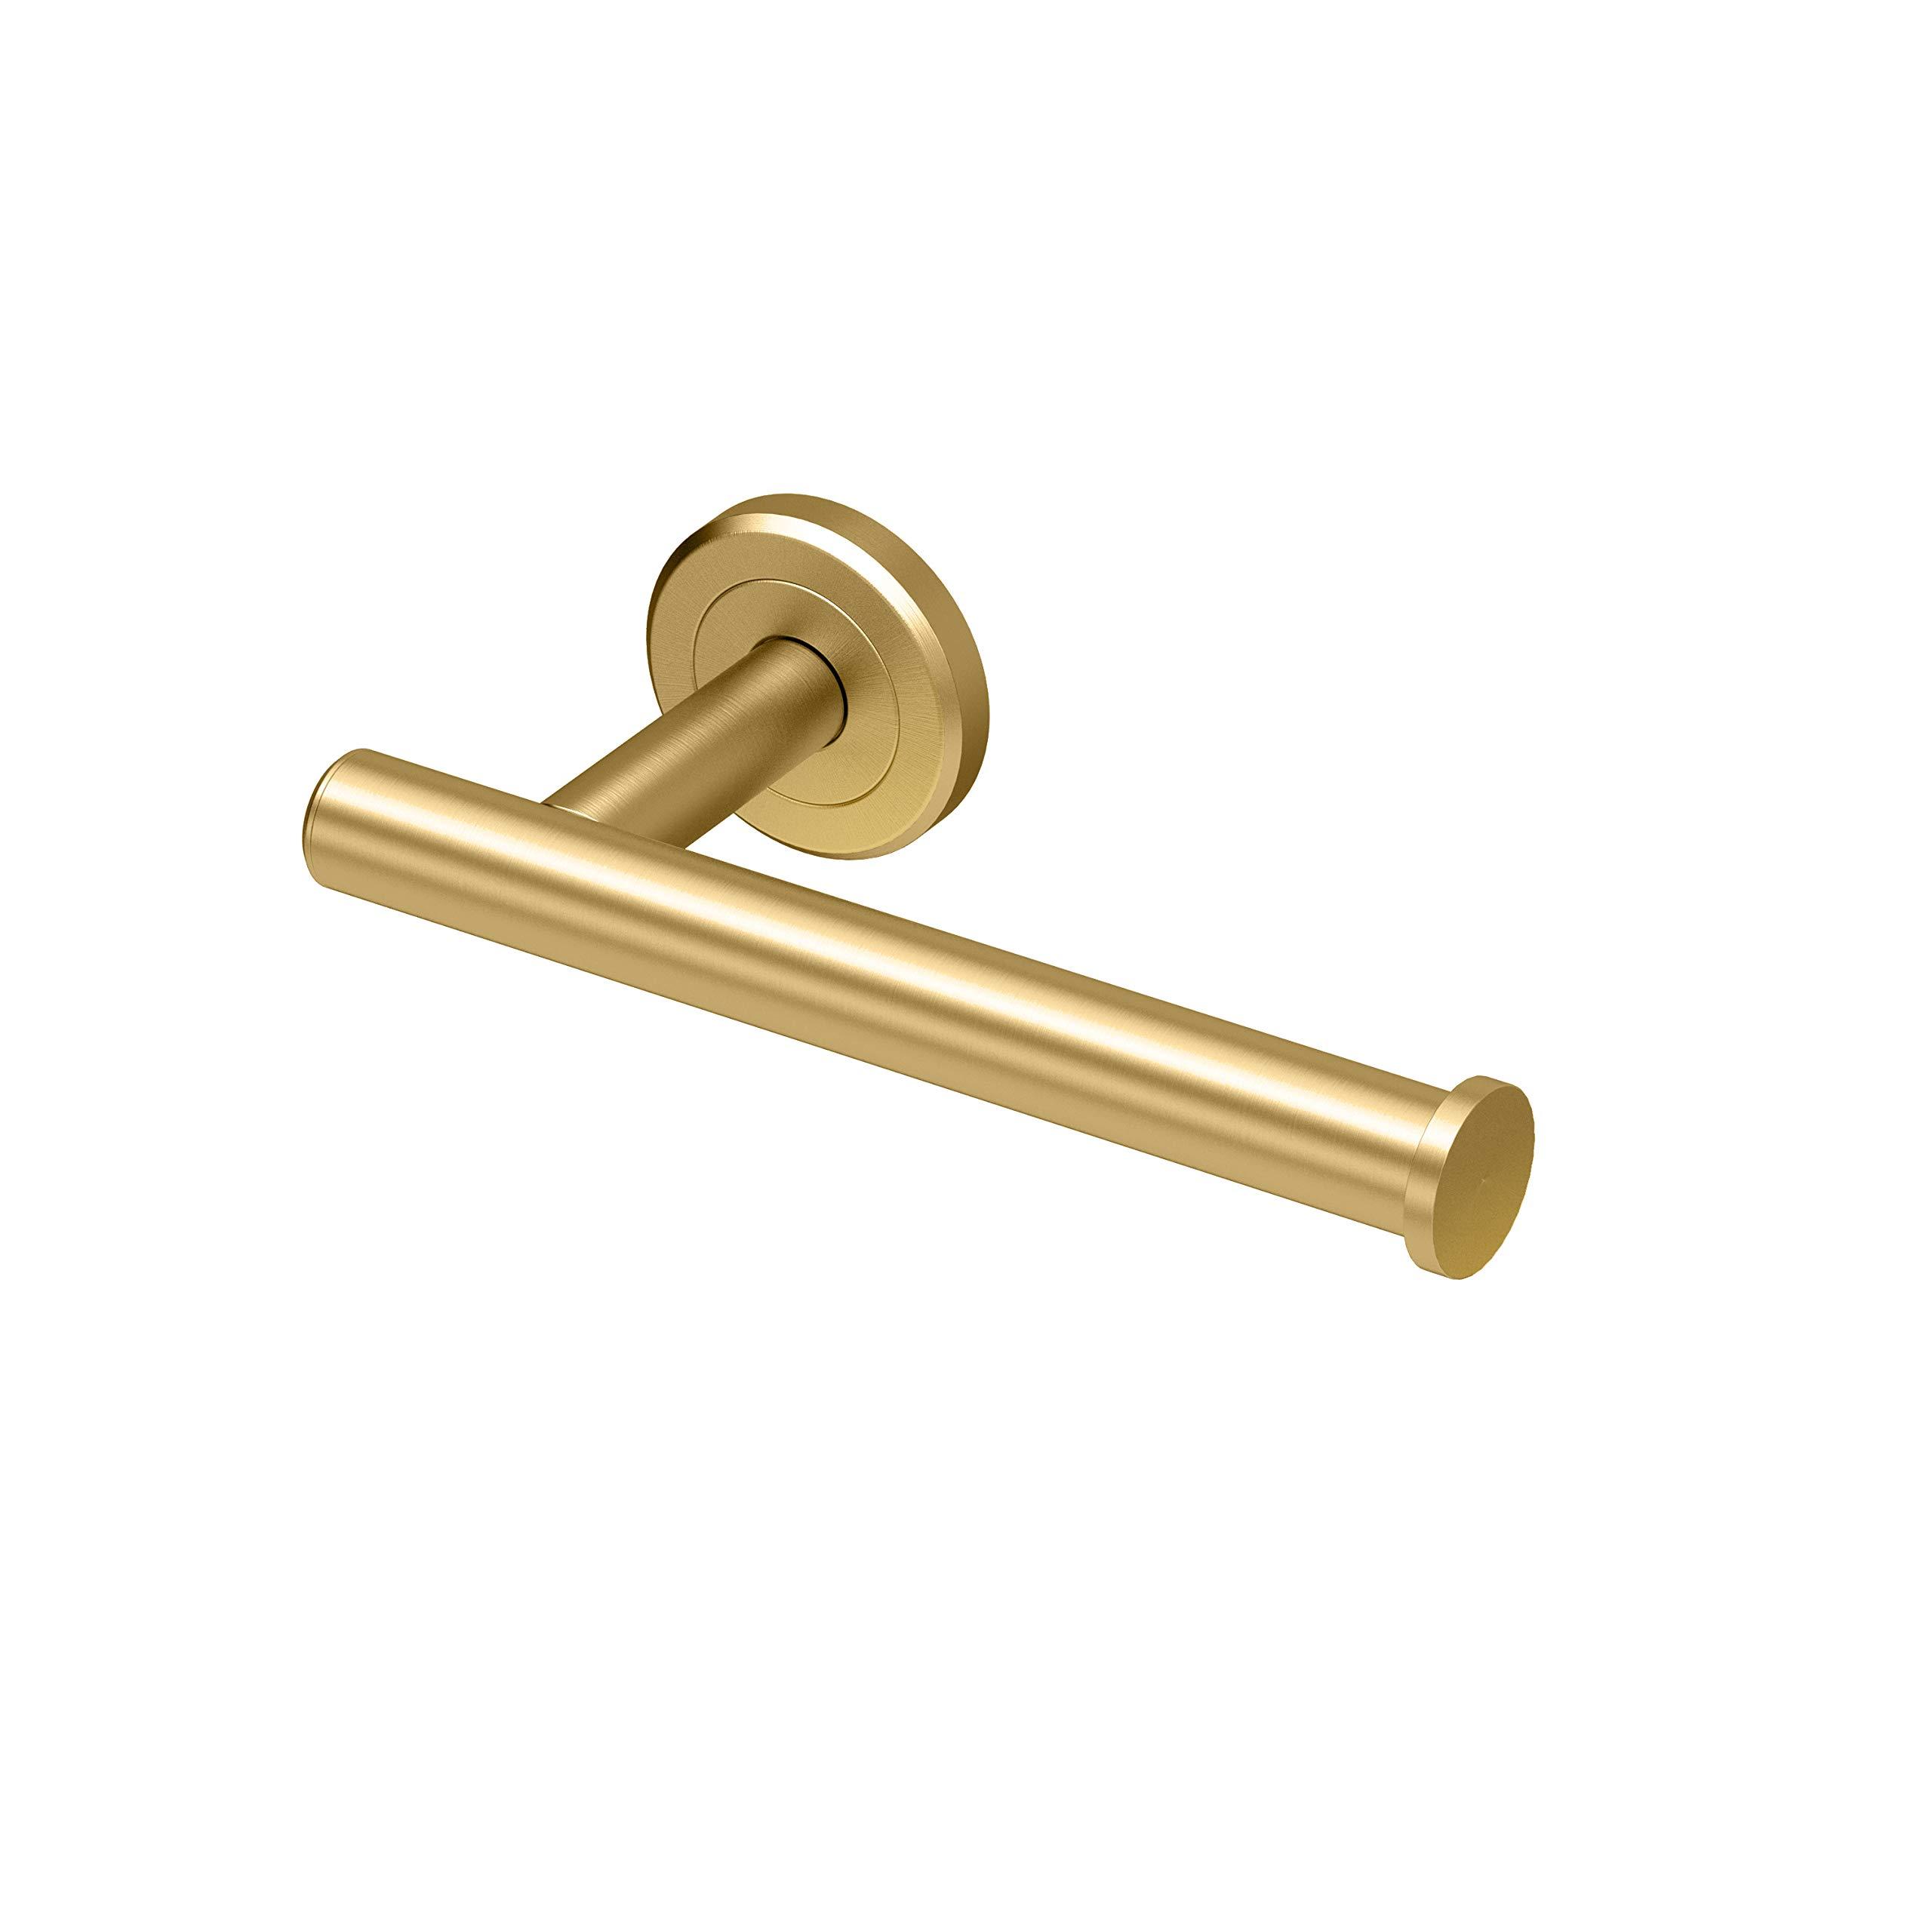 Gatco Latitude II Toilet Paper Holder, Brushed Brass by Gatco (Image #1)